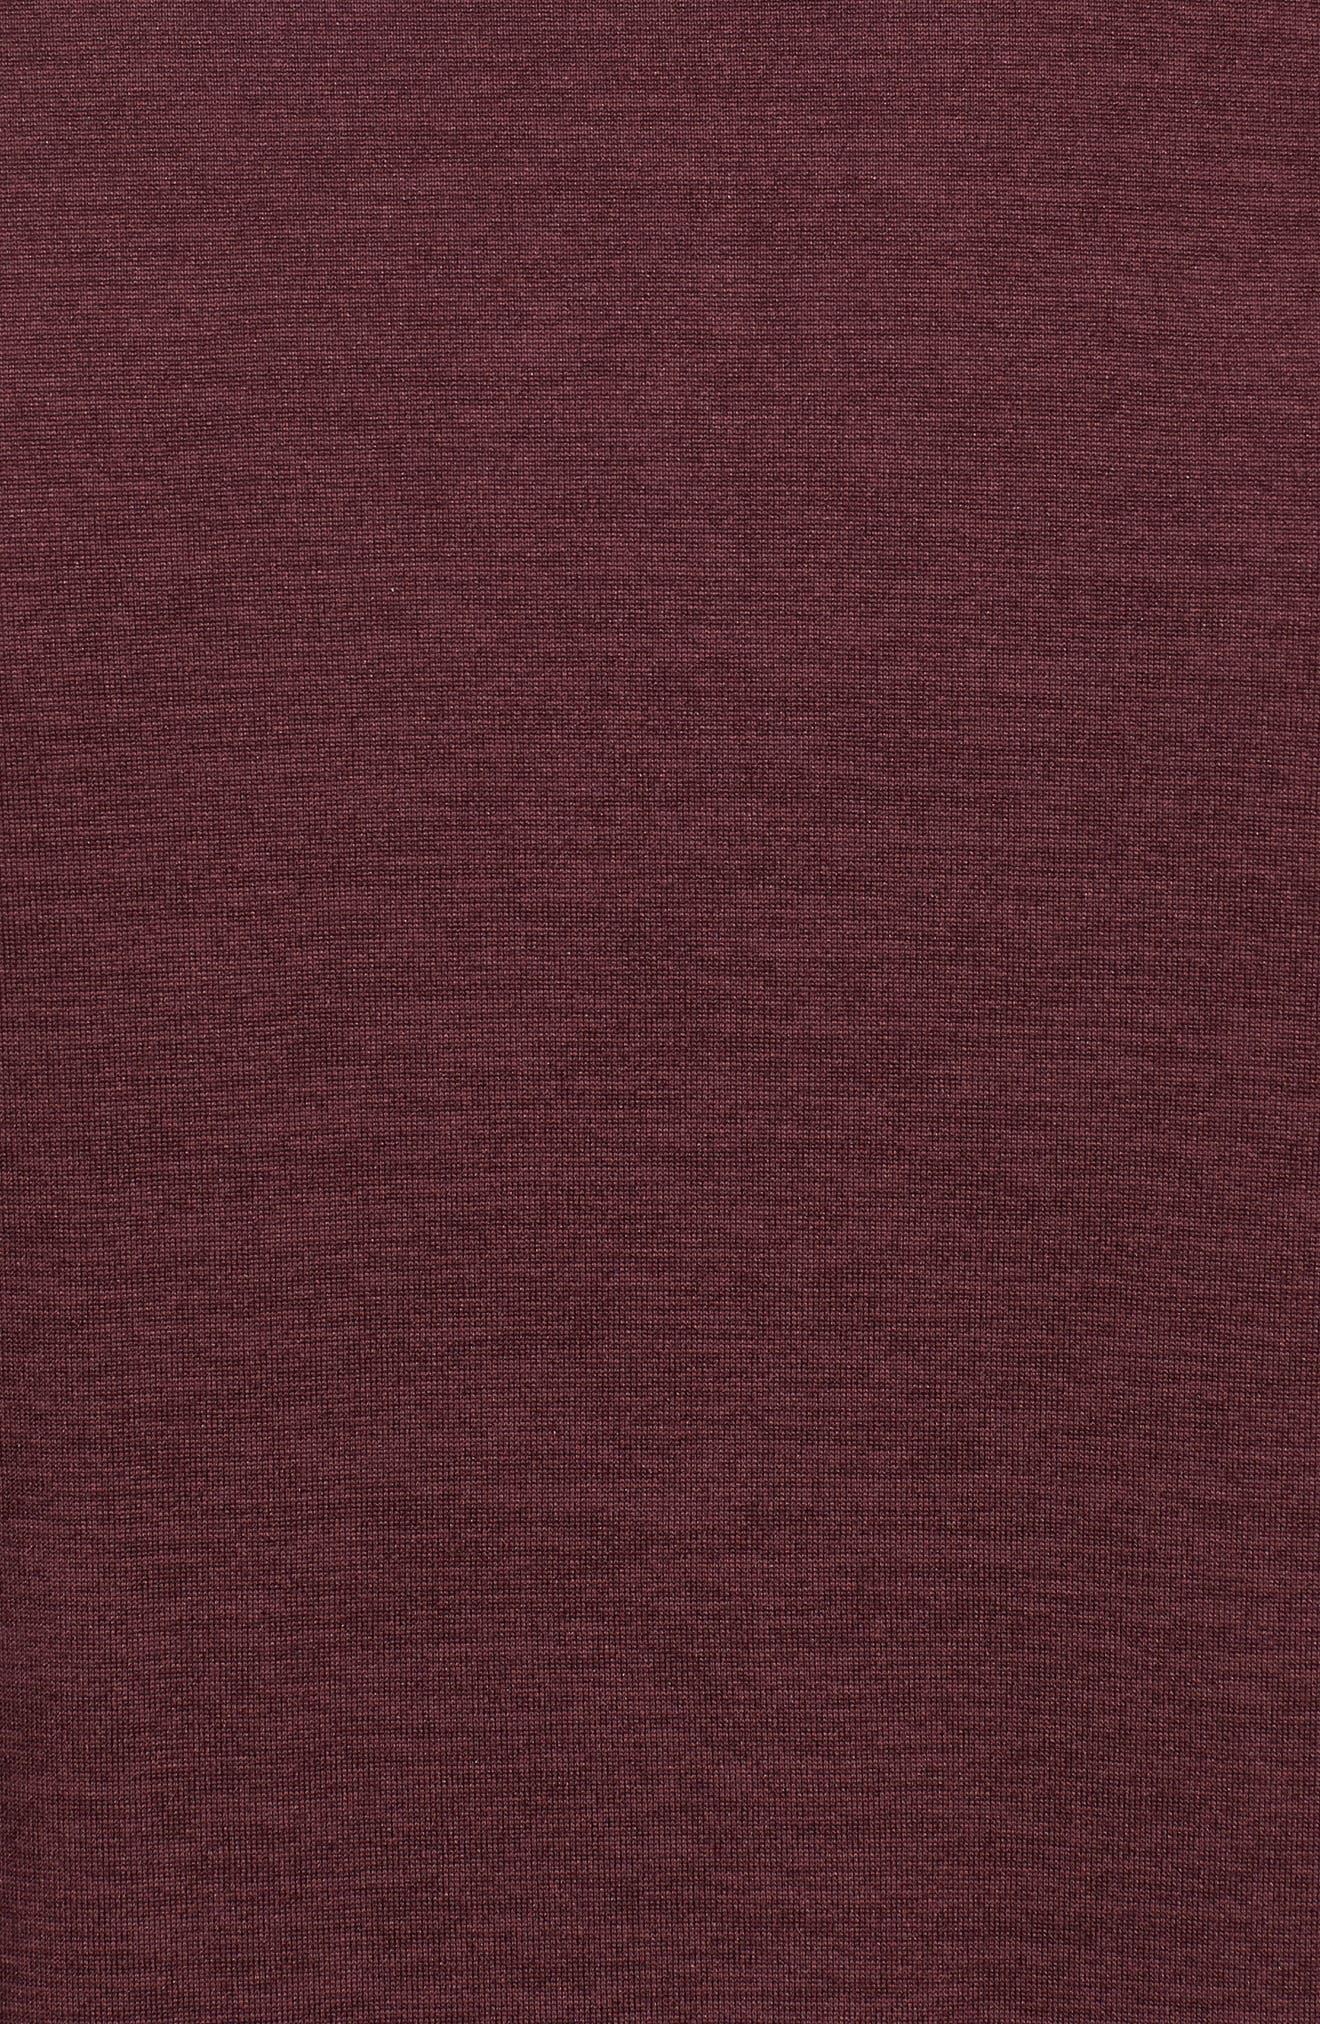 UNDER ARMOUR,                             Tech Half Zip Sweatshirt,                             Alternate thumbnail 5, color,                             600